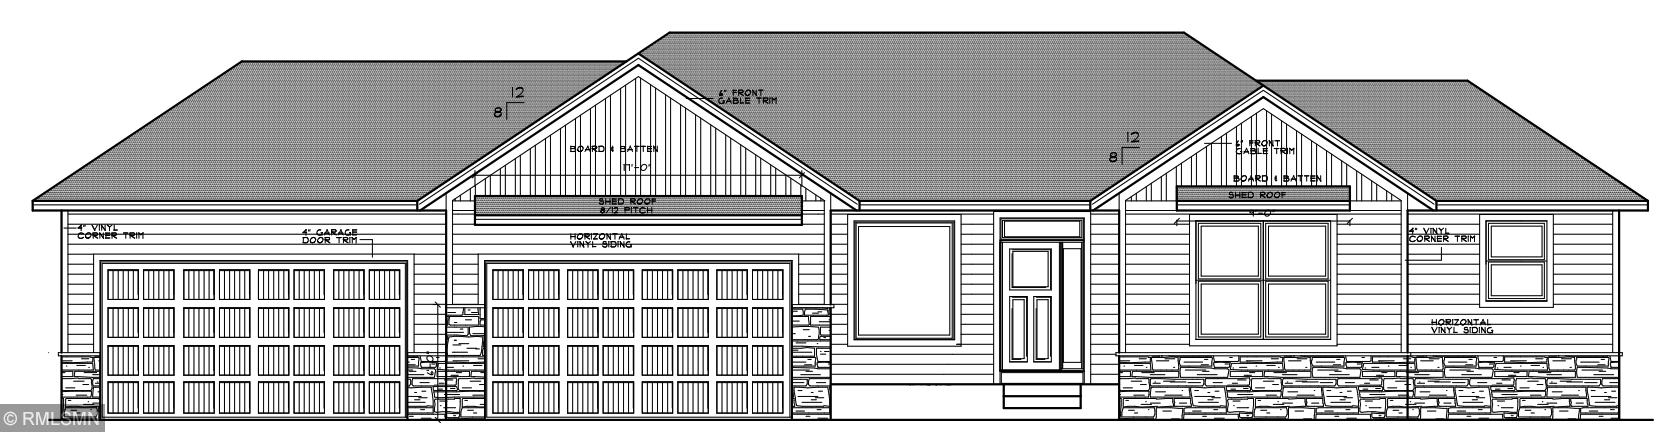 XXXX 220th Avenue NW Property Photo - Big Lake, MN real estate listing